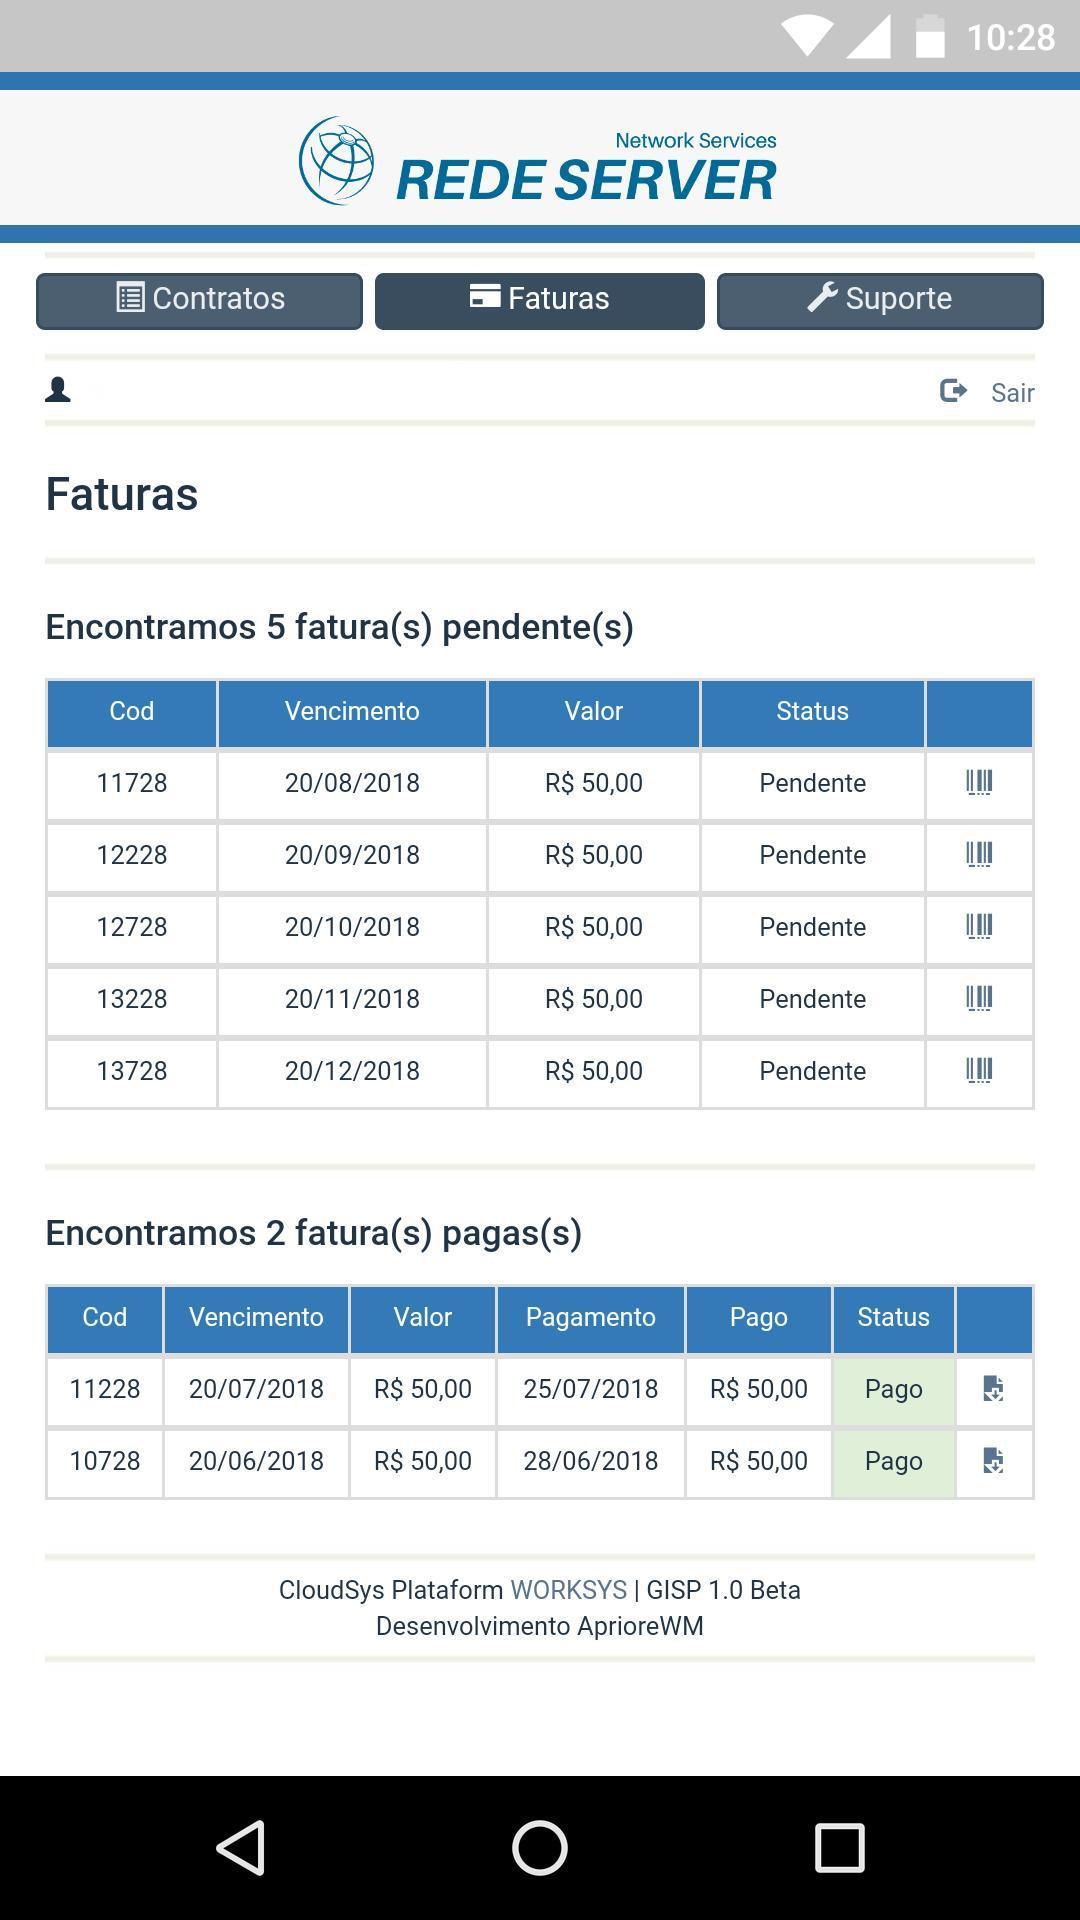 Rede Server Telecom For Android Apk Download